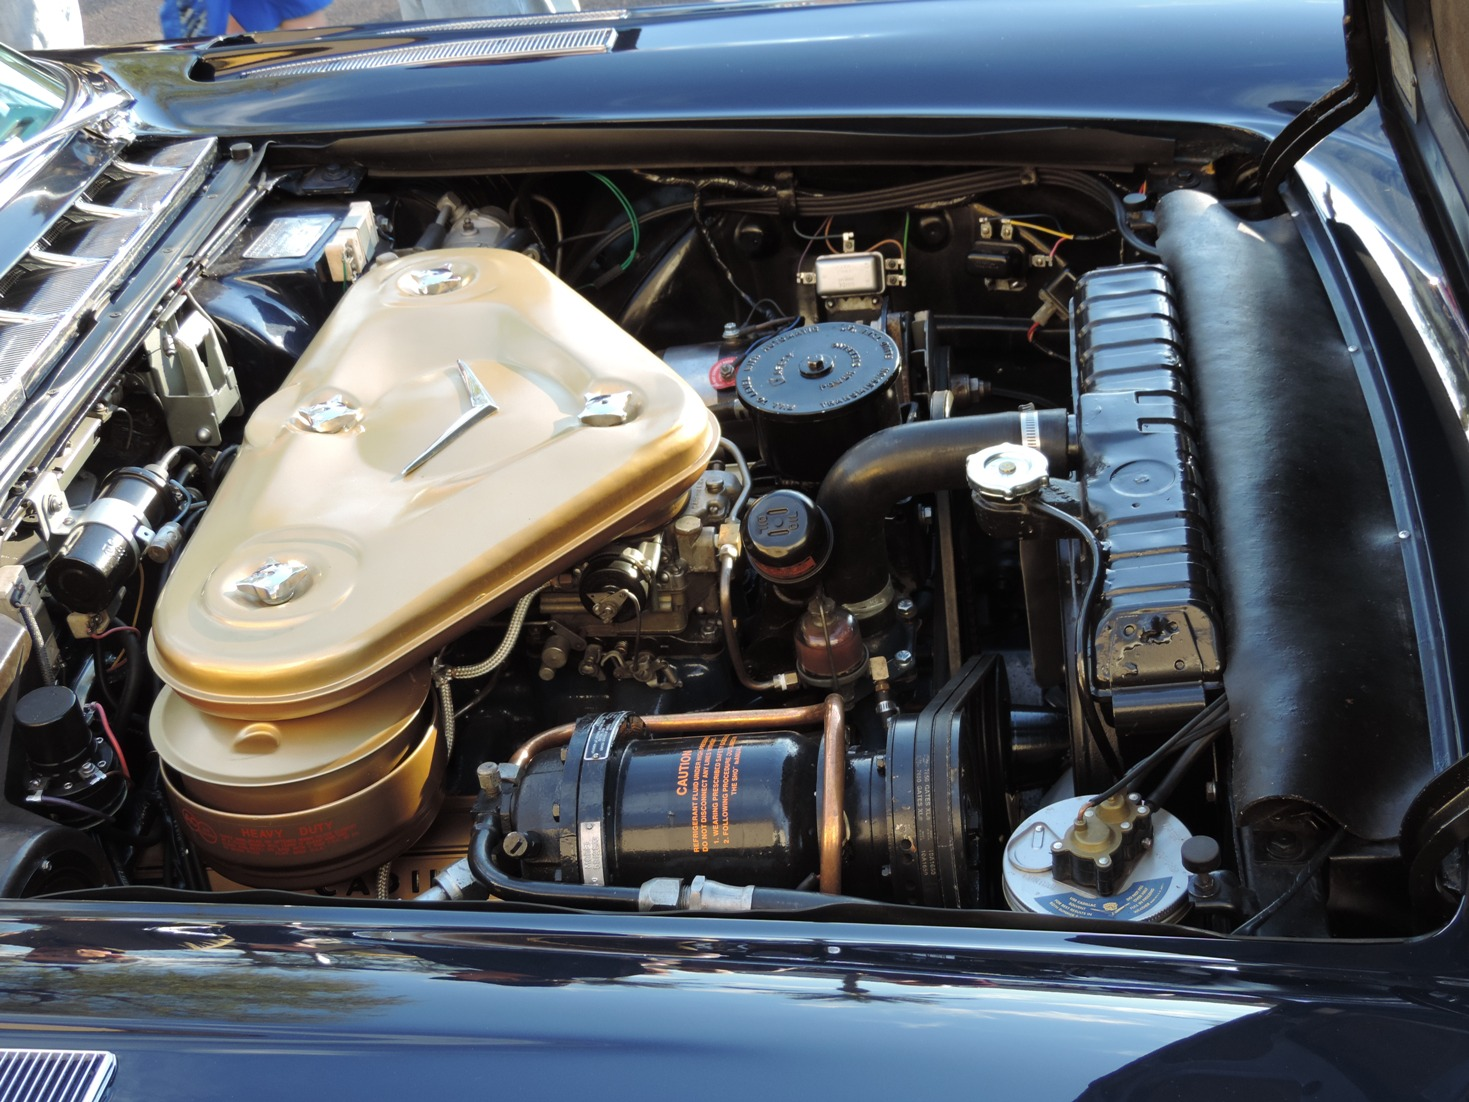 1957 Cadillac Eldorado Brougham Bat wing air cleaner